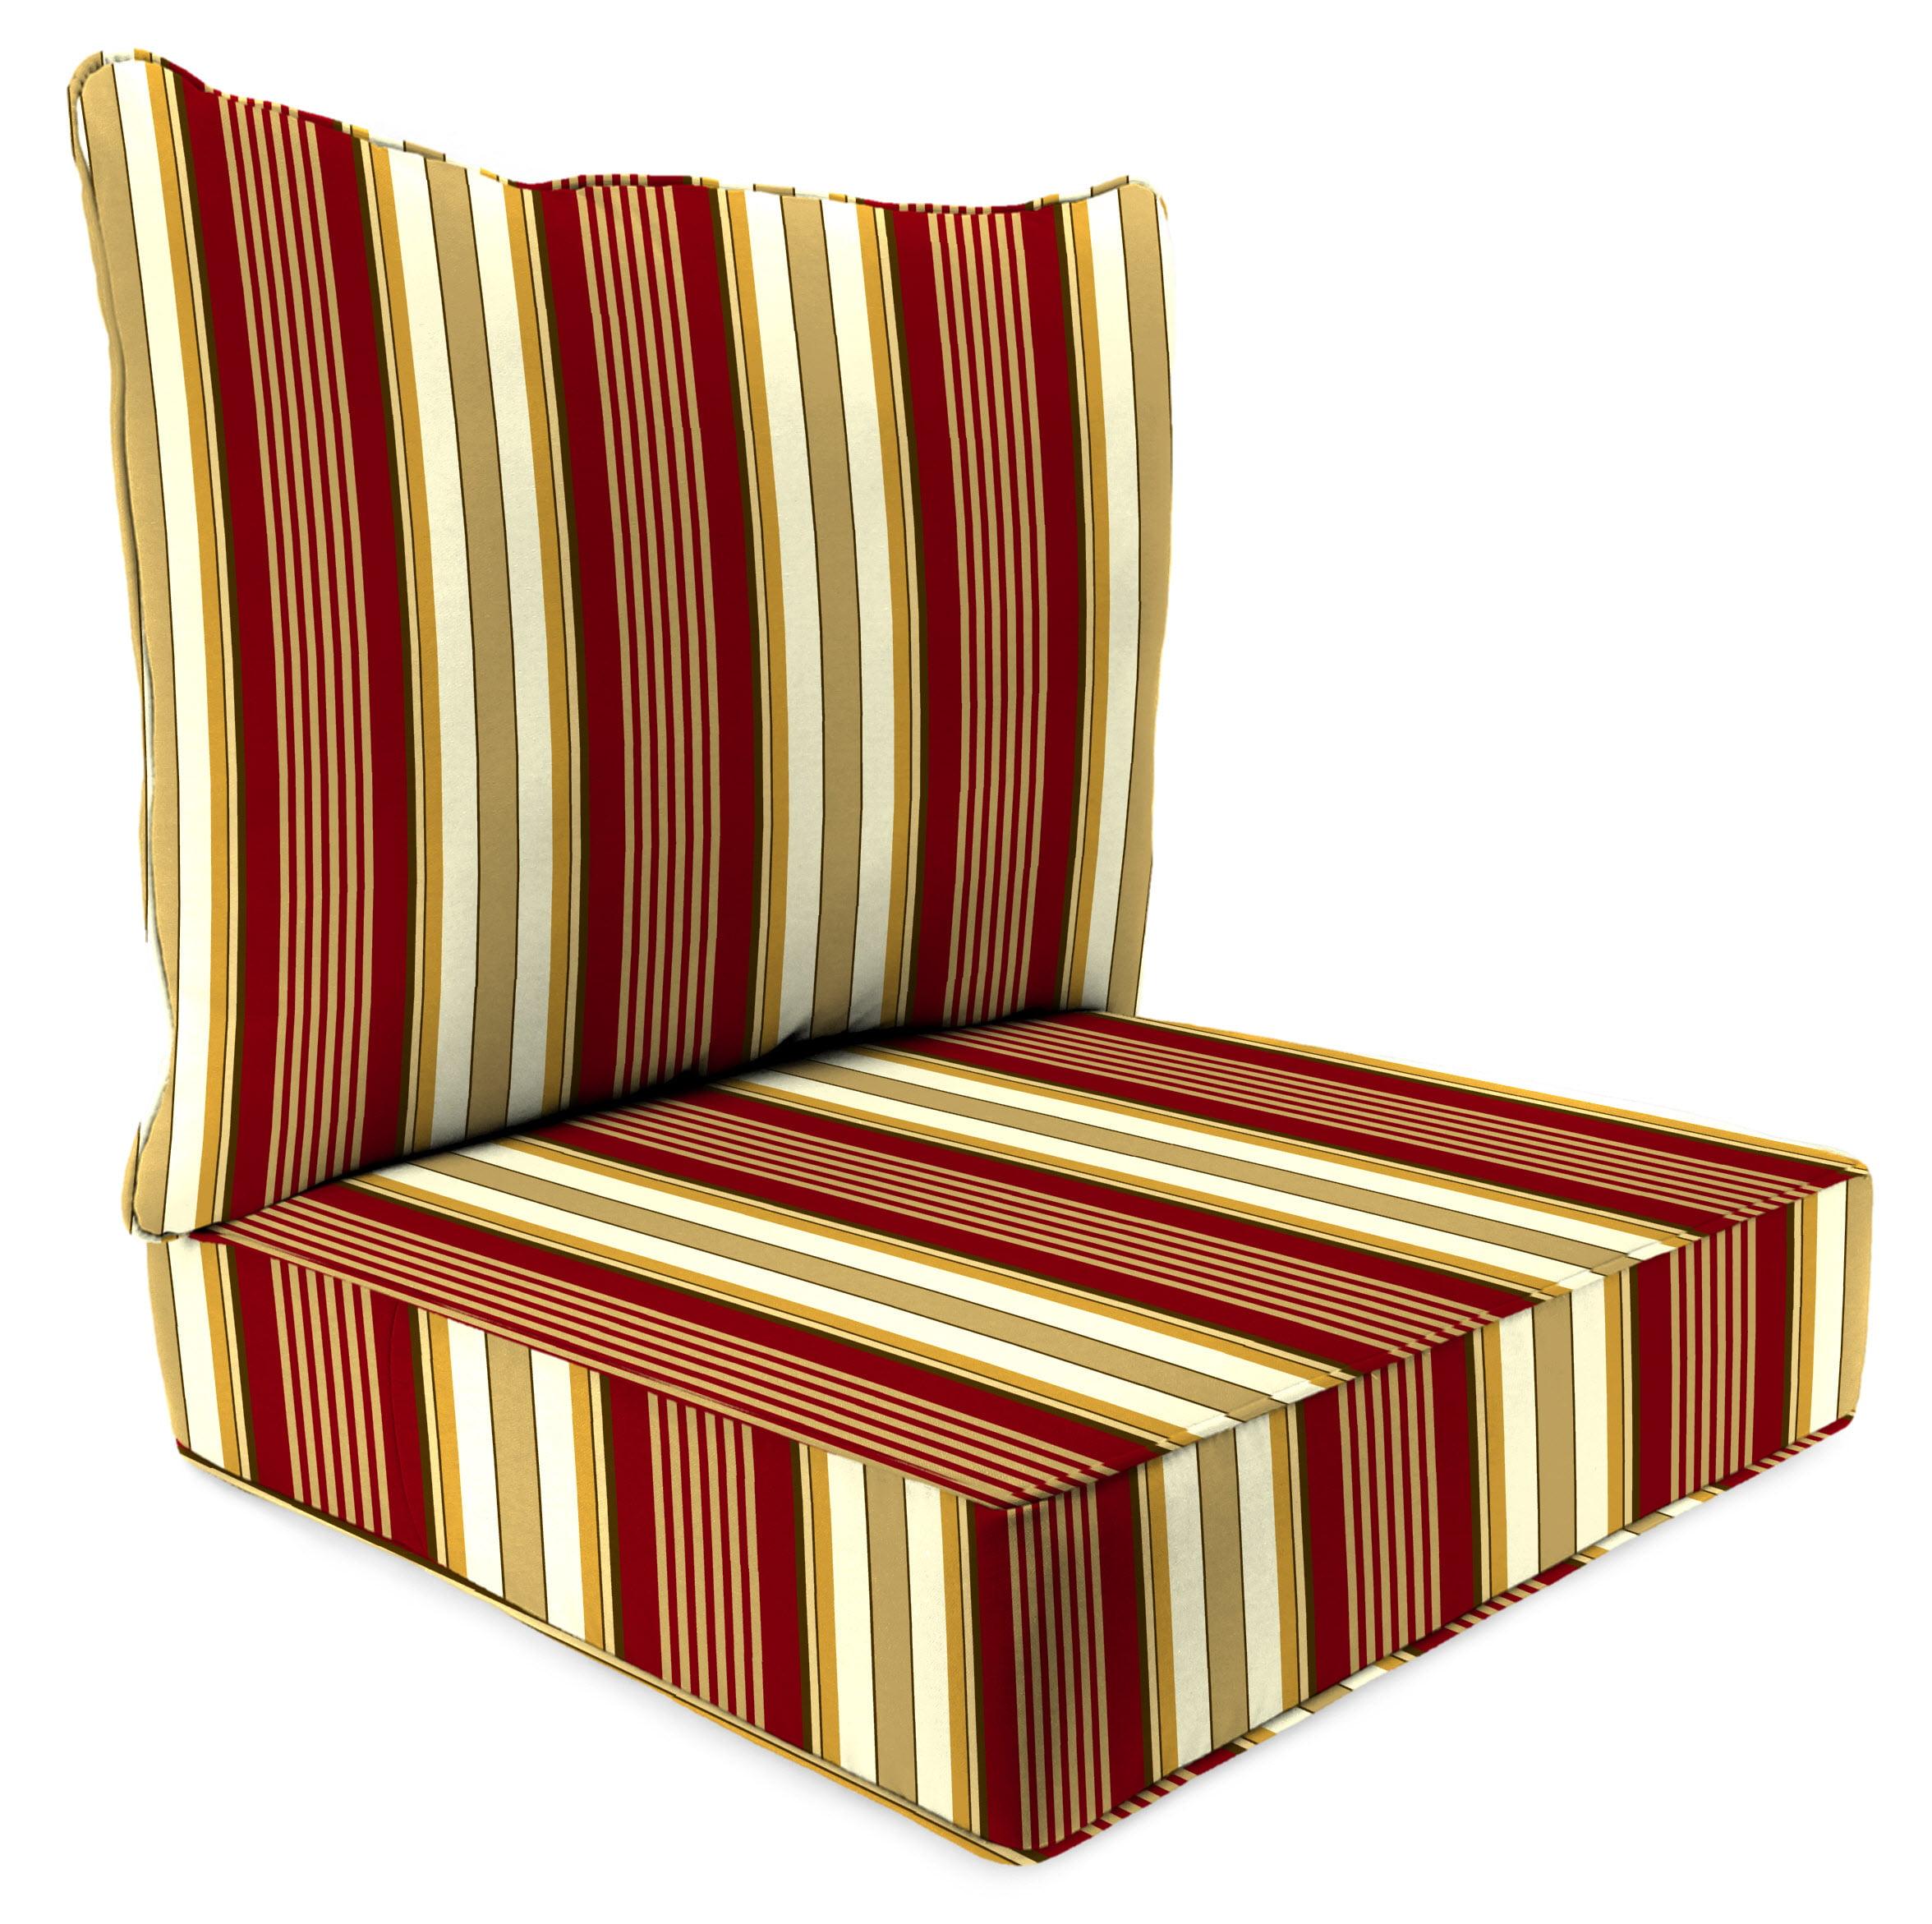 Jordan Manufacturing Mainstays Aubrey Stripe Outdoor Deep Seating Cushion Set